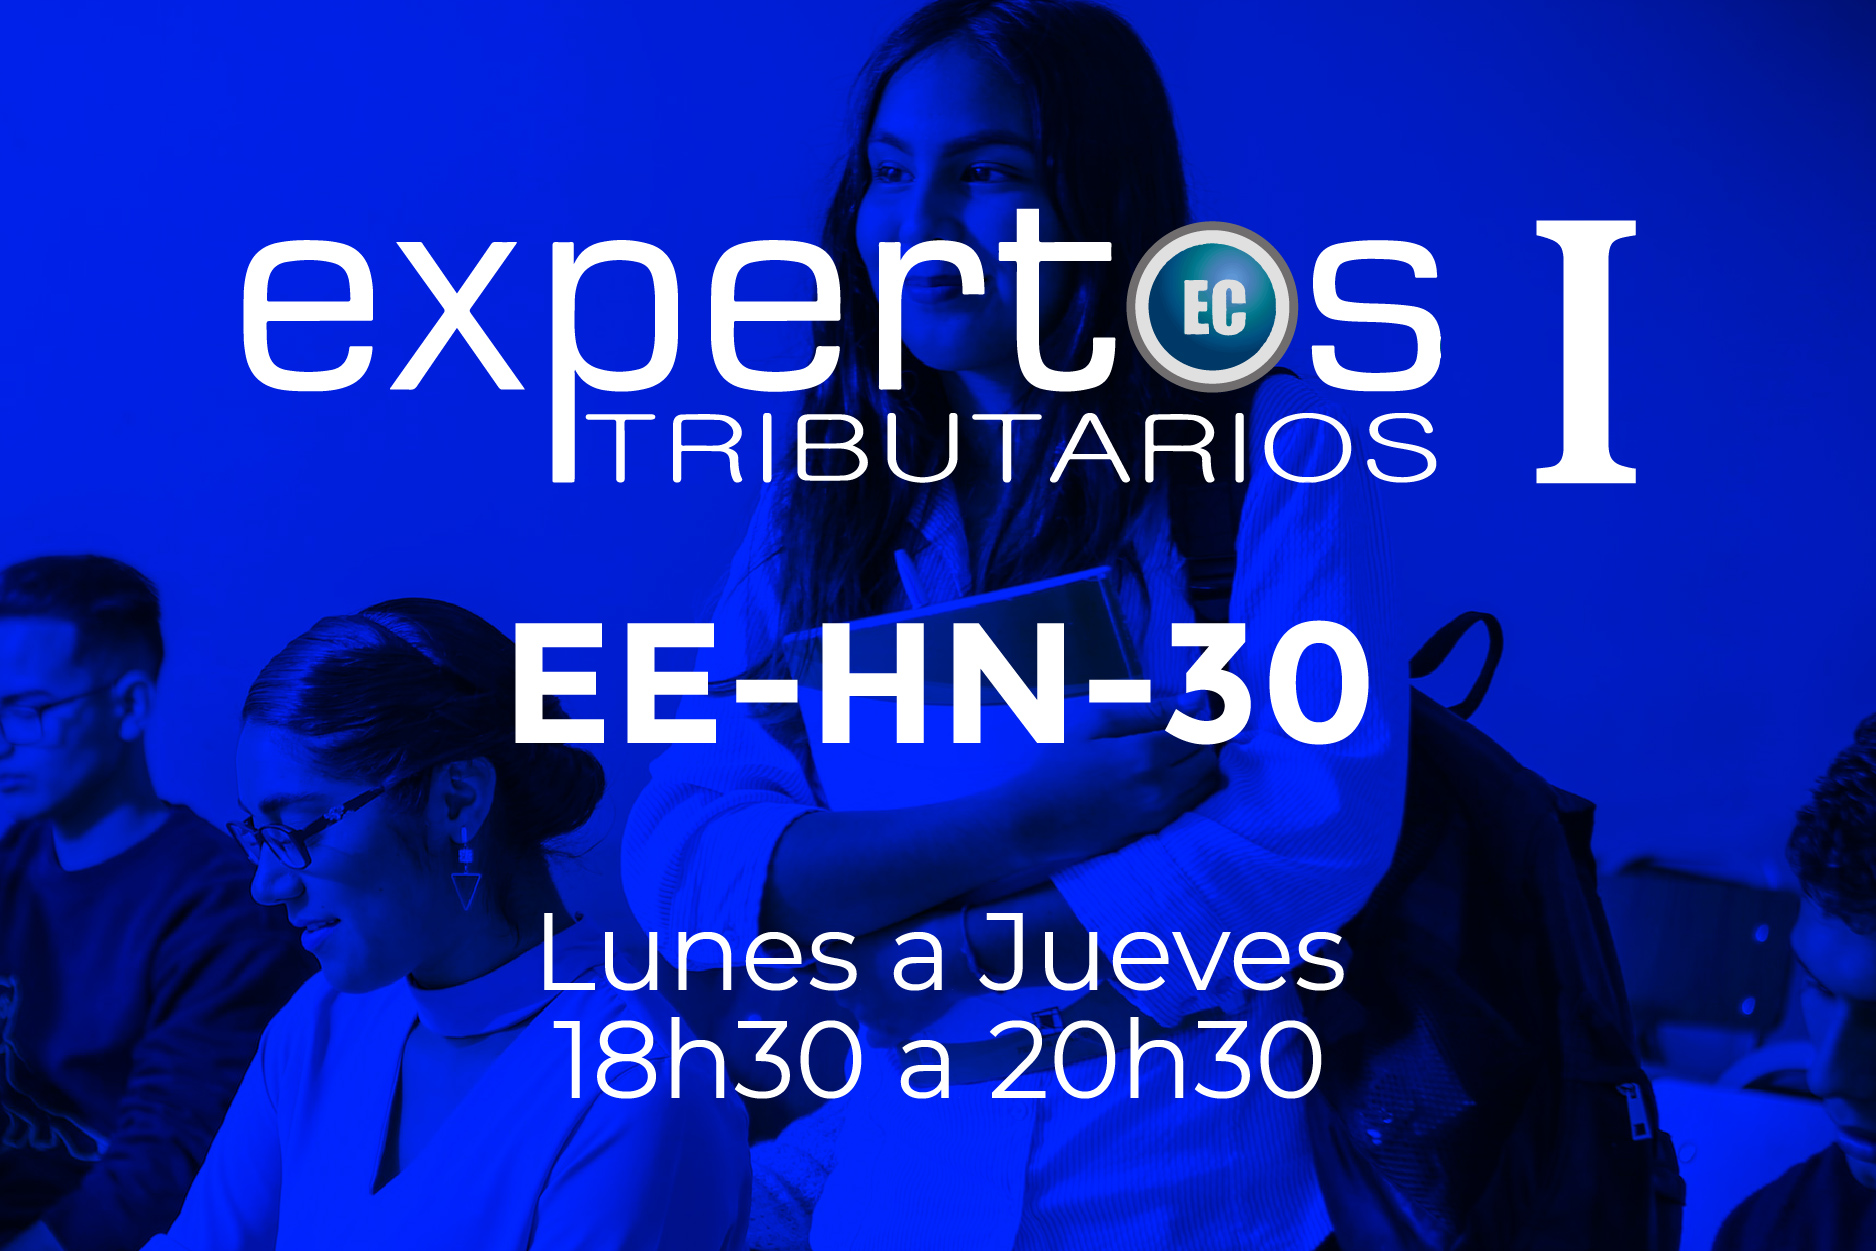 30 - EXPERTOS TRIBUTARIOS - LUNES A JUEVES - 18:00 A 20:30